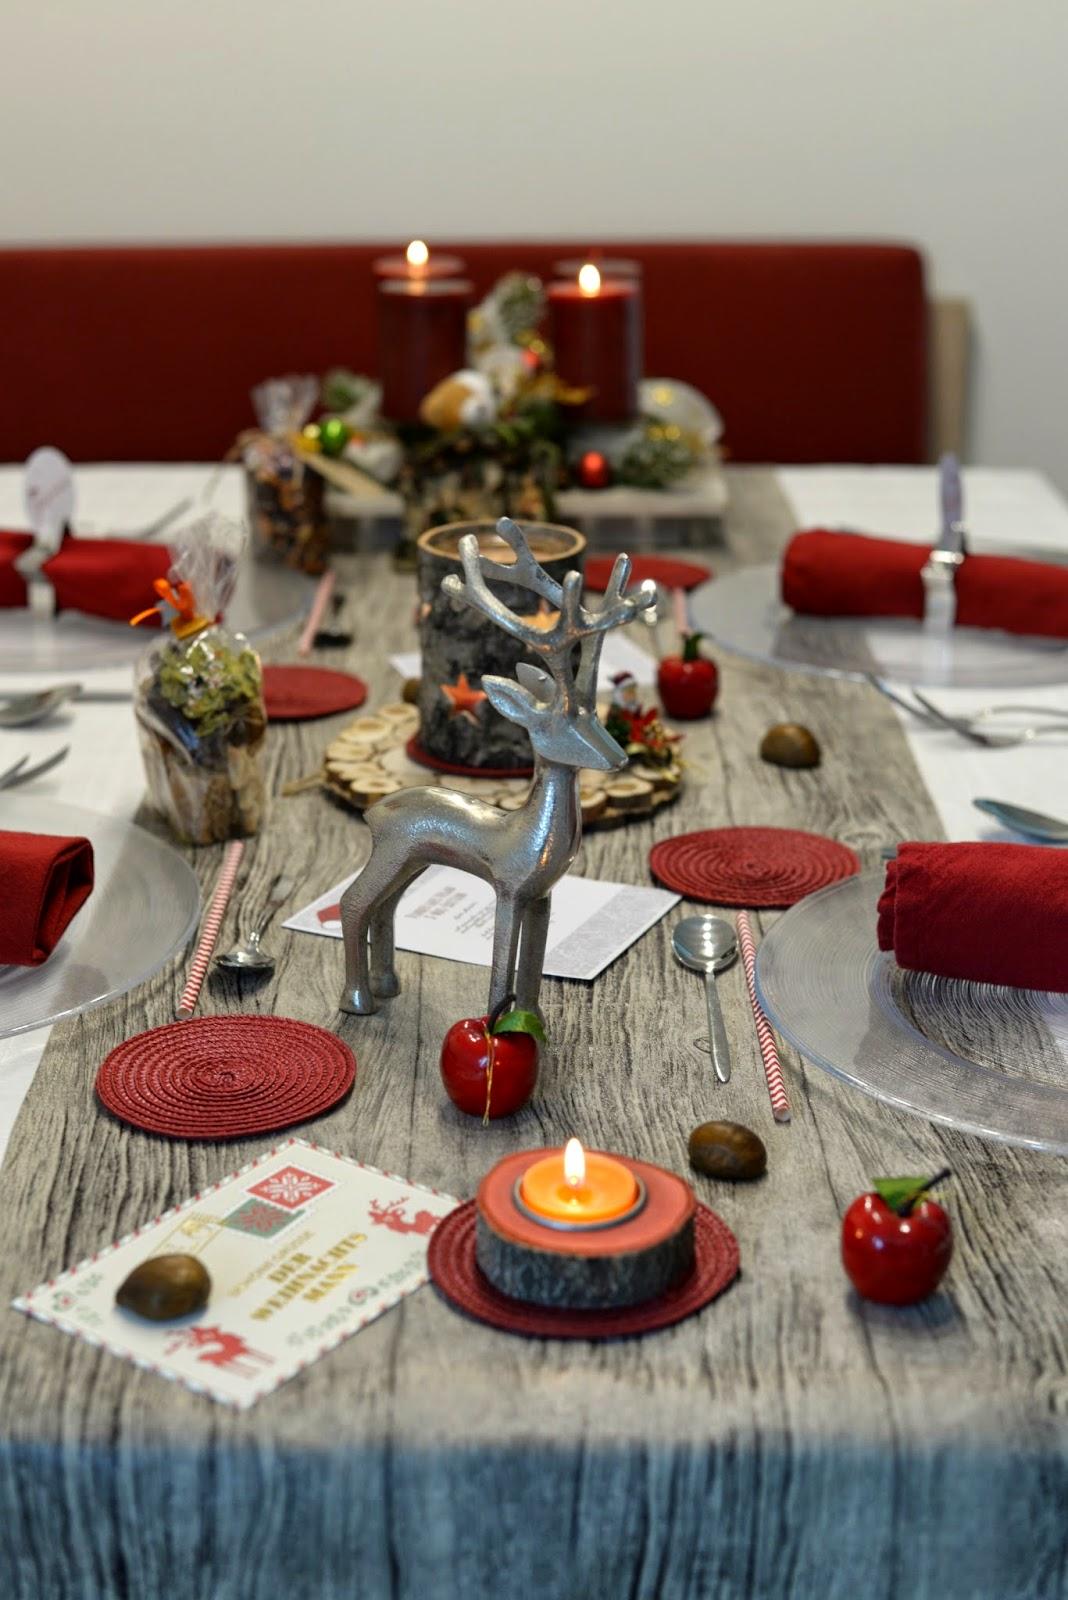 Tischdeko, weihnachten, dinner, weihnachtsessen, christmas, veganes dinner, dinner goes vegan